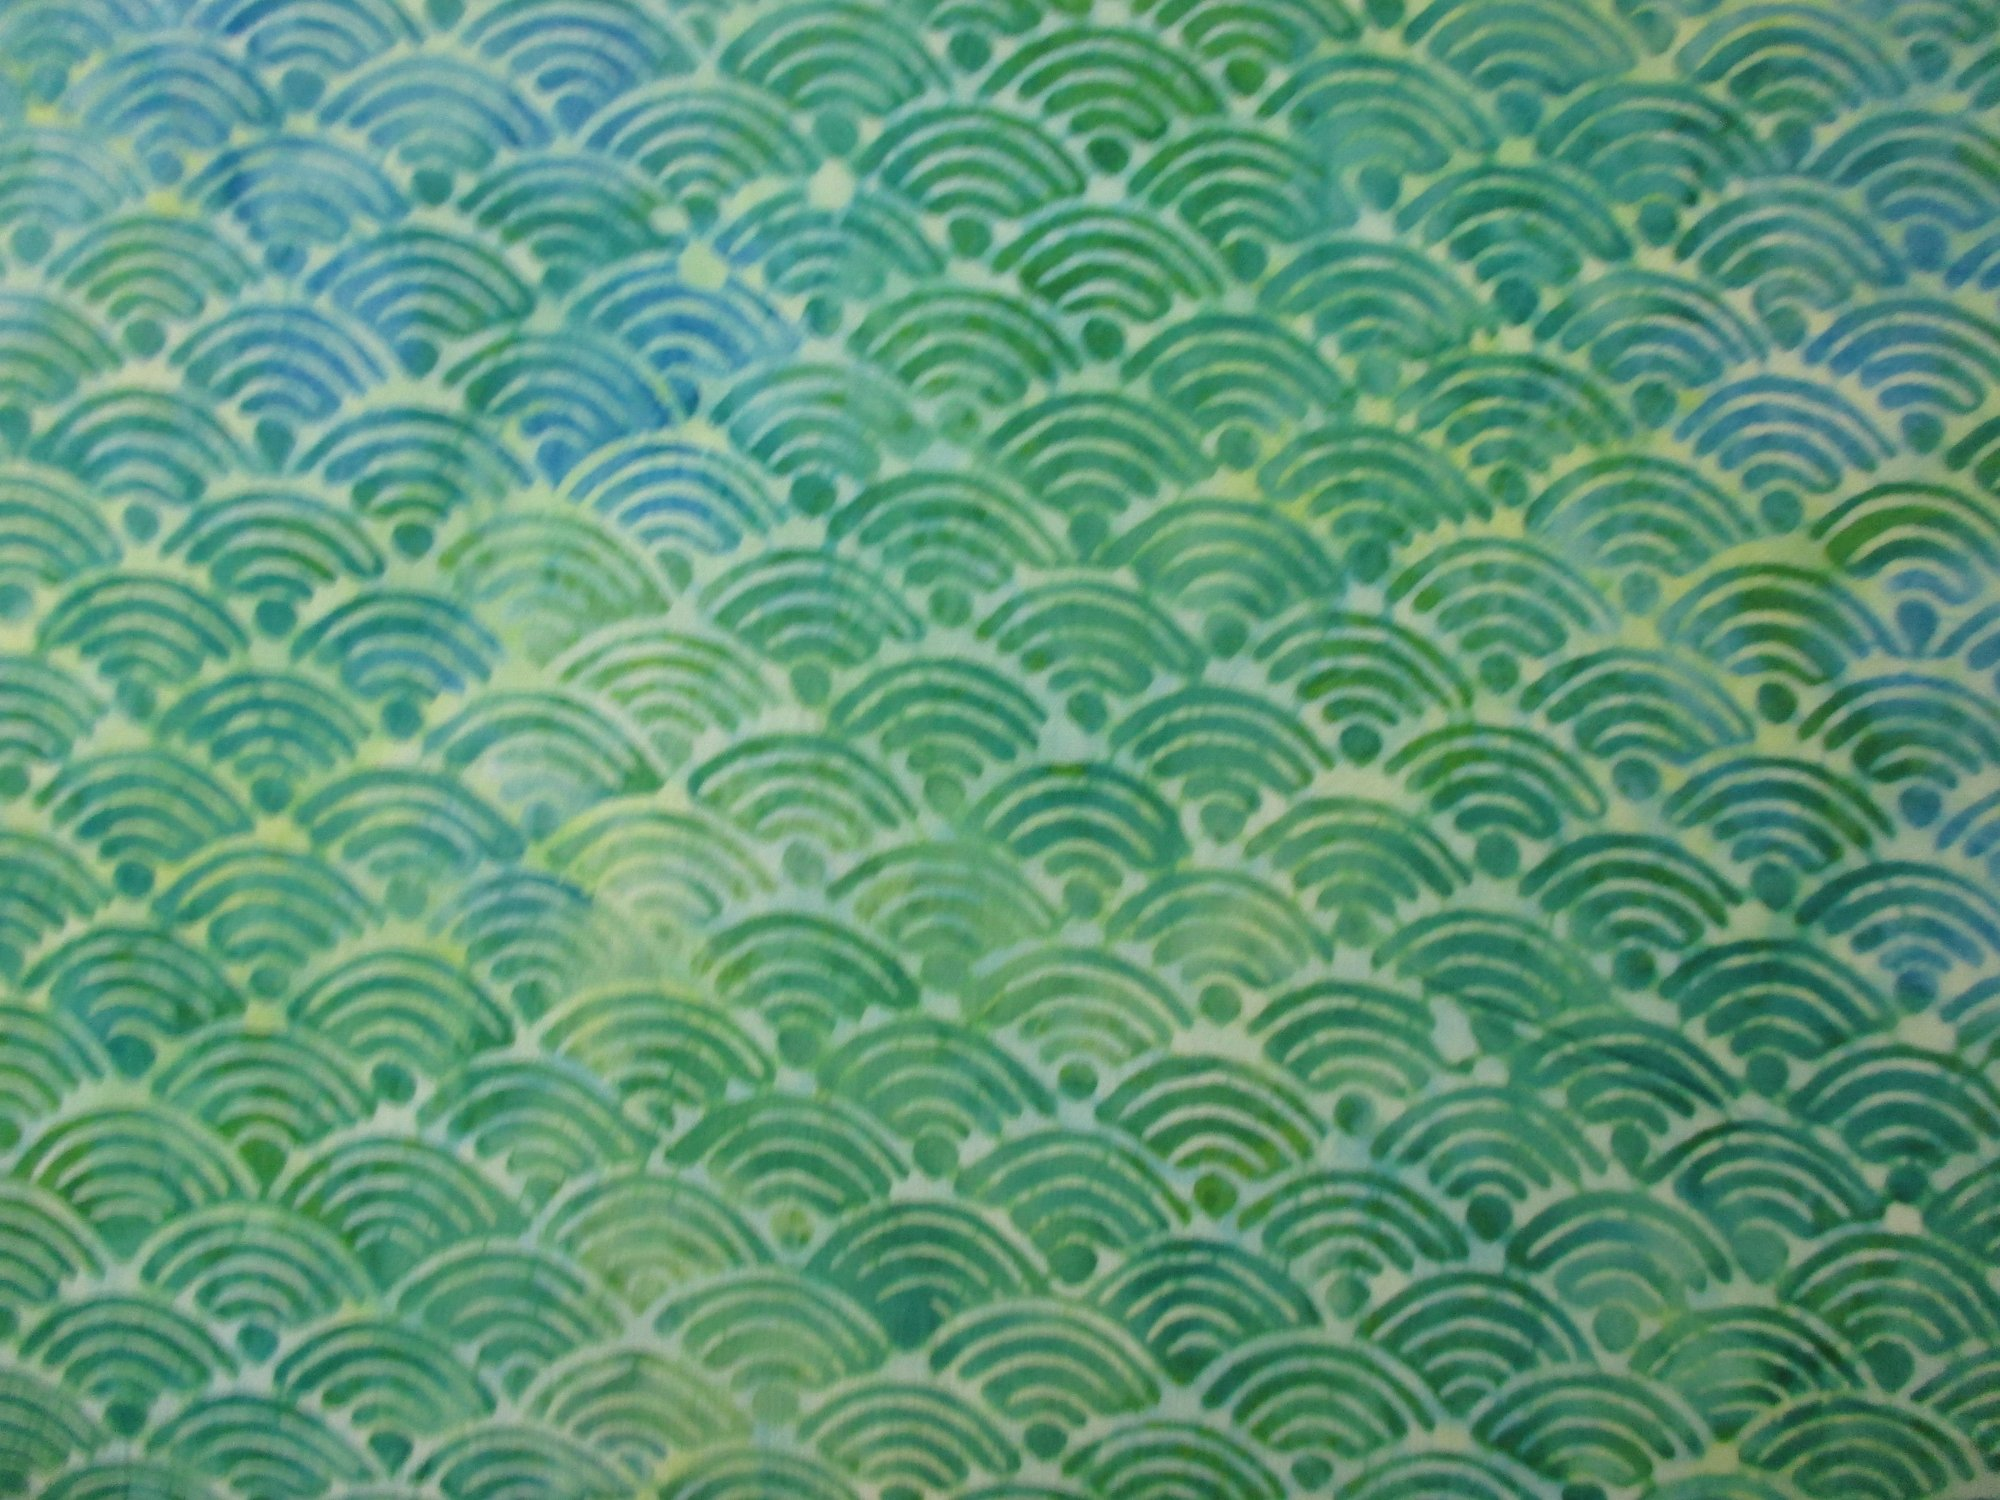 Diamond Bali Batiks - Turquoise